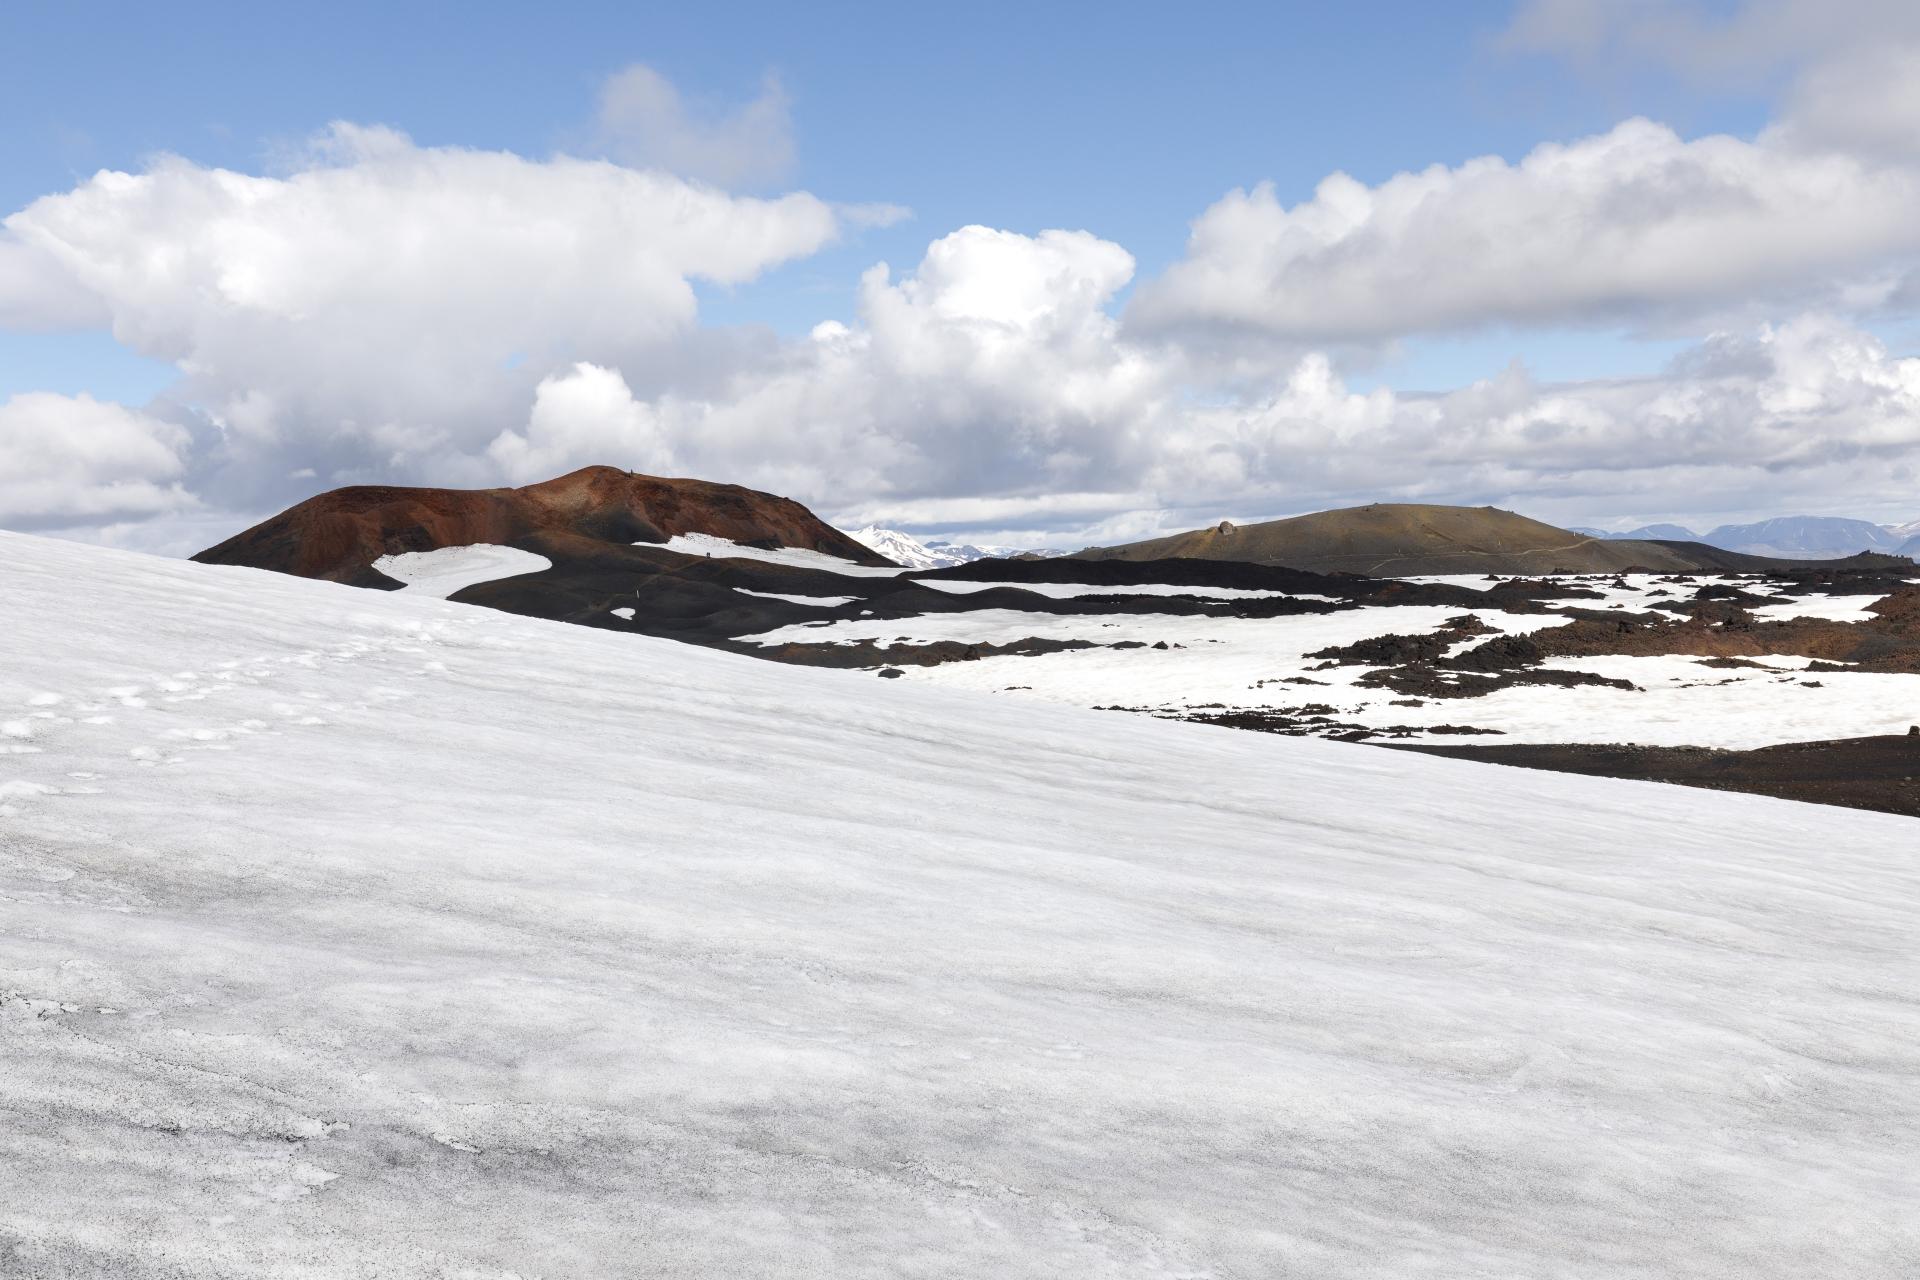 Magni, Brattafönn und das Lavafeld Goðahraun